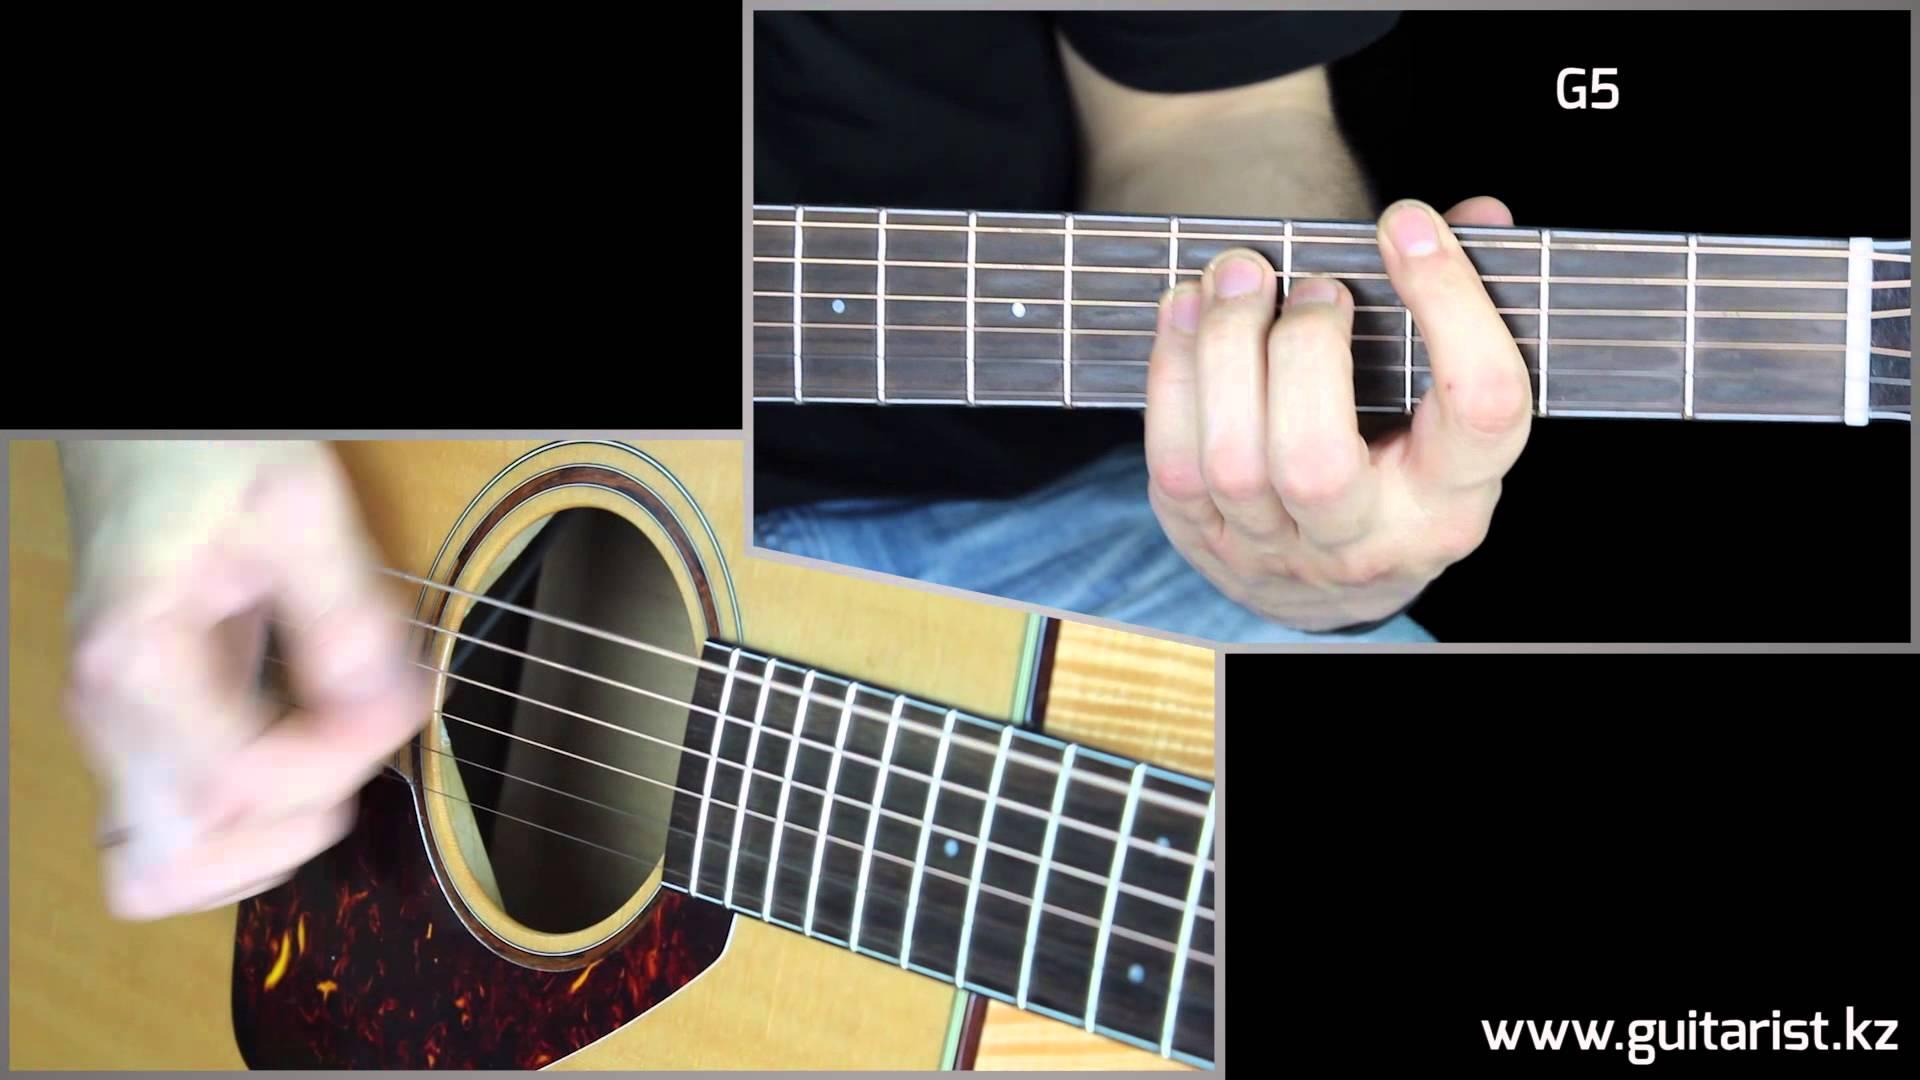 Adele - Rolling In The Deep guitar lesson (Уроки игры на гитаре Guitarist.kz)